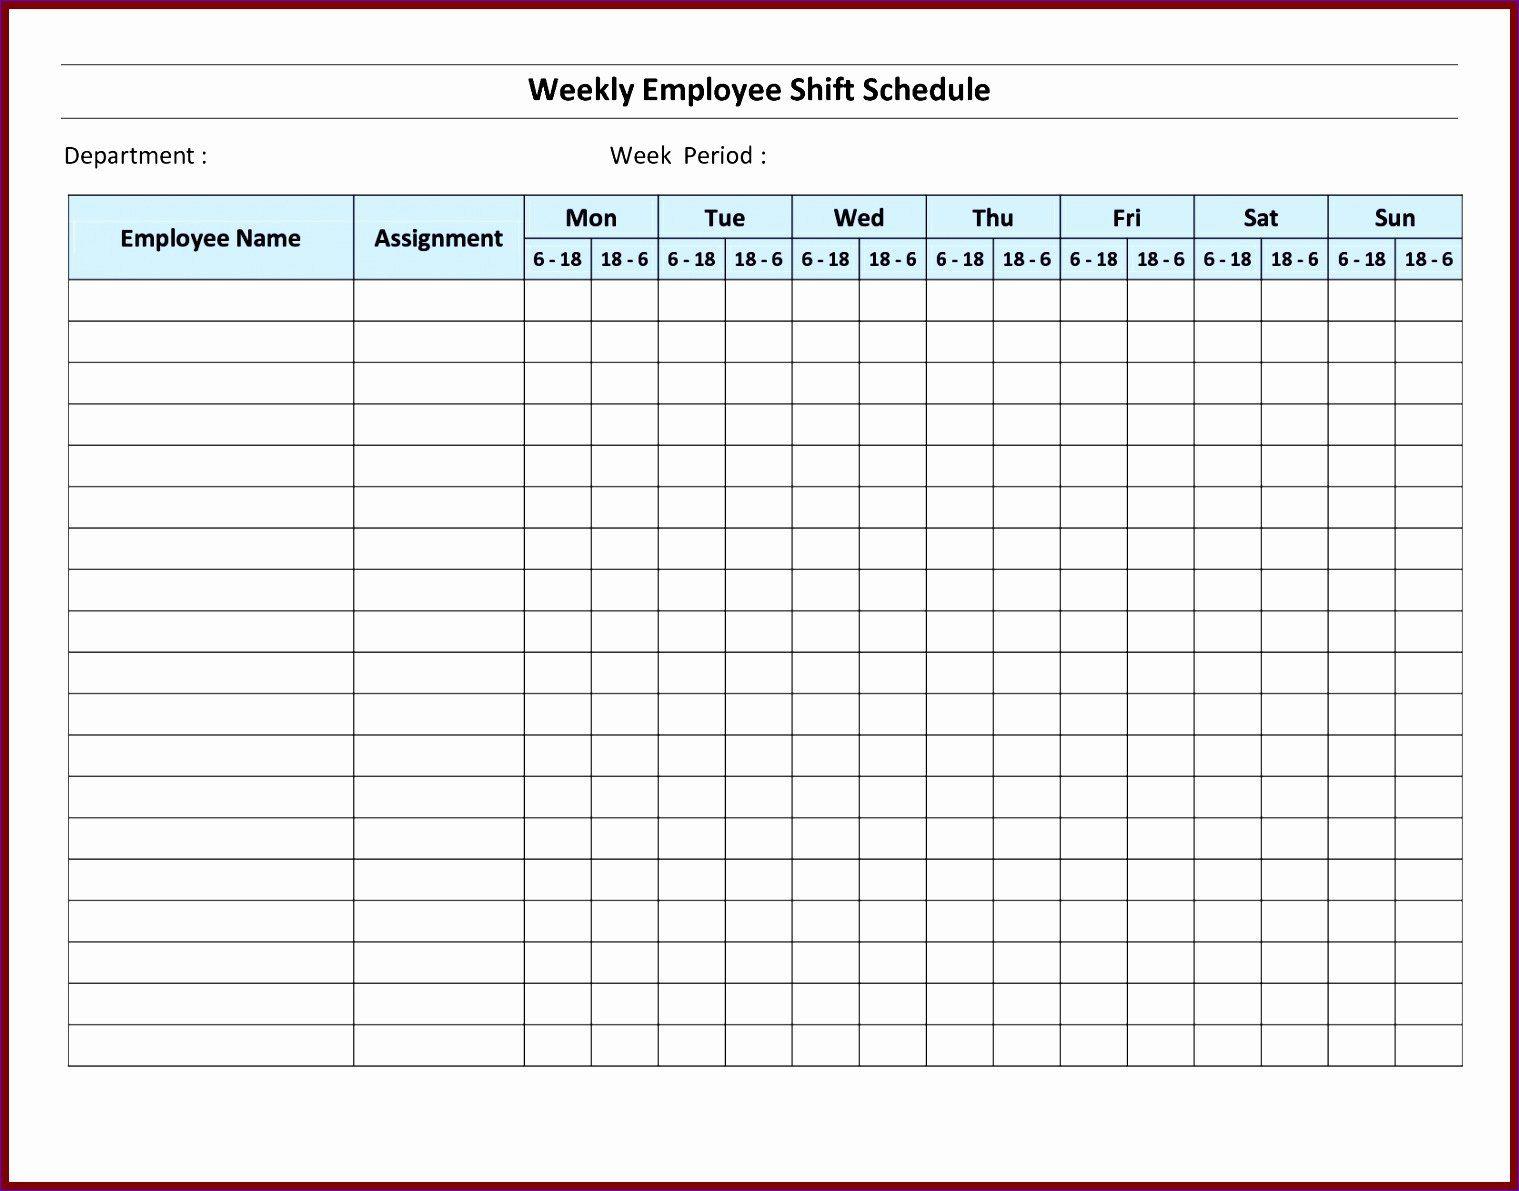 Free Employee Work Schedule Template Inspirational 7 Monthly Staff Schedule Template Excel Excel Schedule Template Schedule Templates Monthly Schedule Template